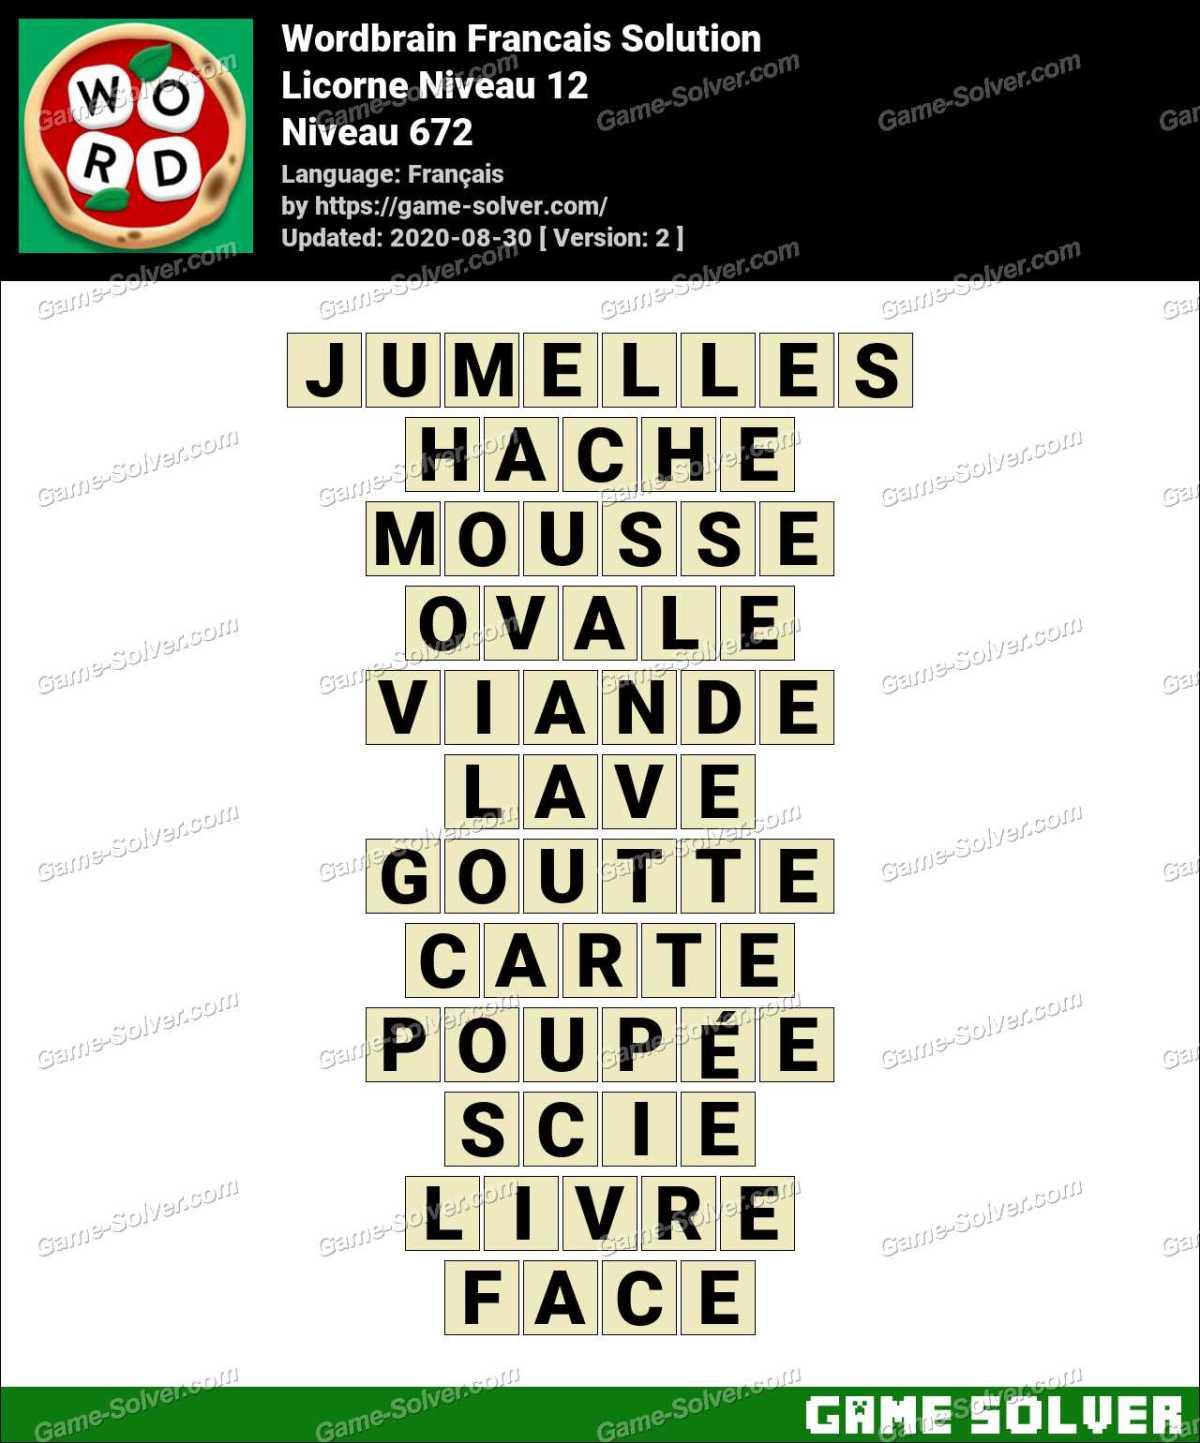 WordBrain Français Licorne Niveau 12